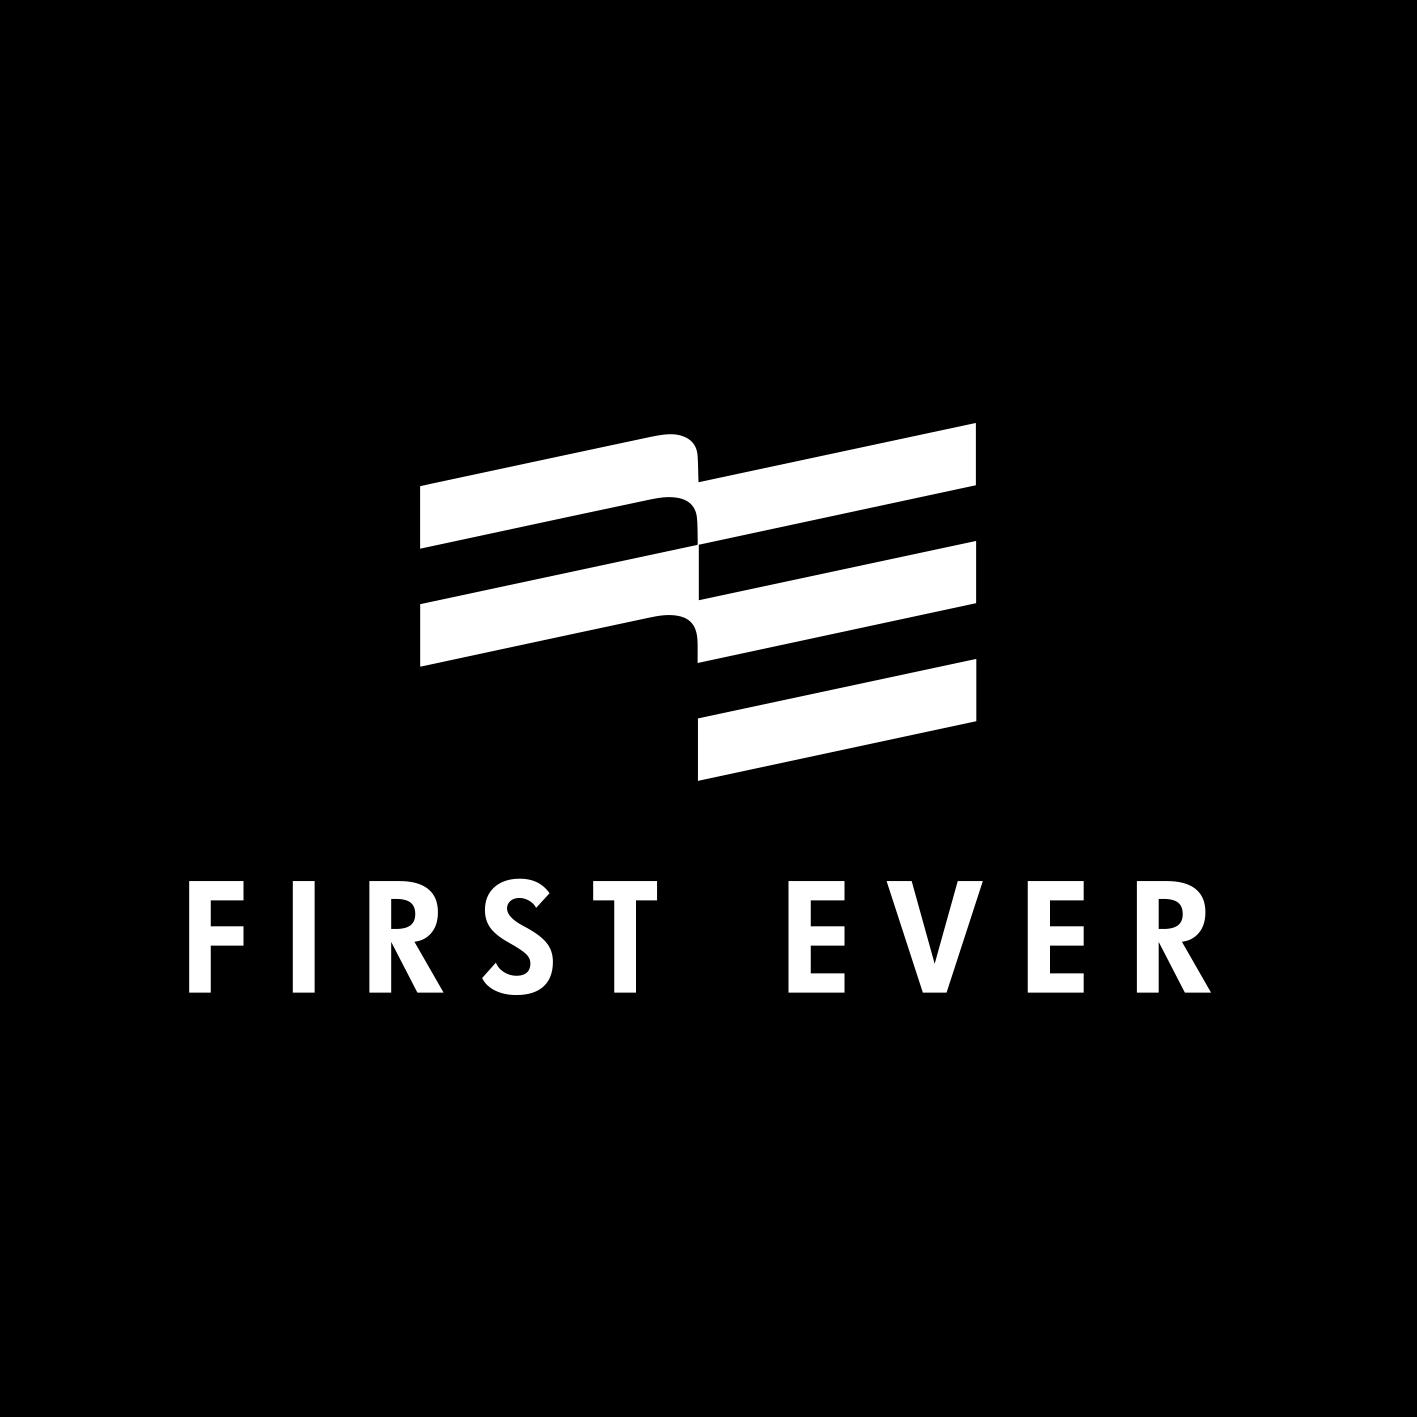 logo first ever